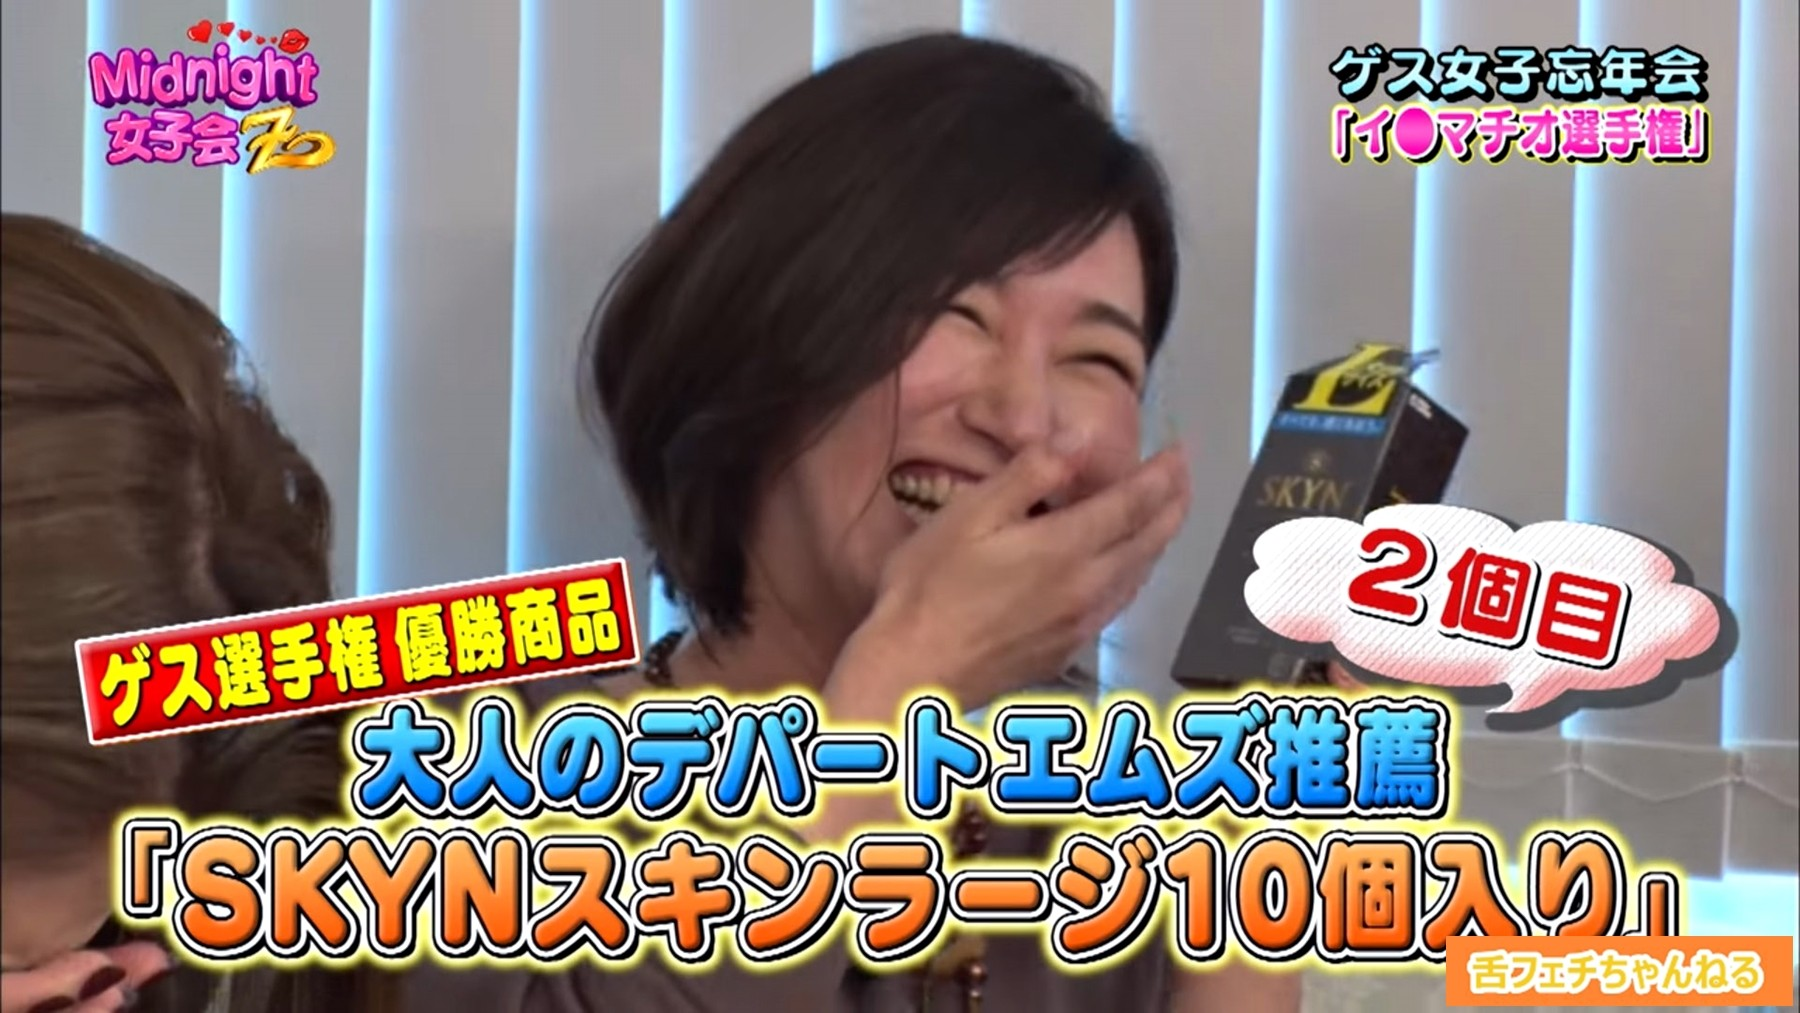 Midnight女子会 イラマチオ選手権 (42)